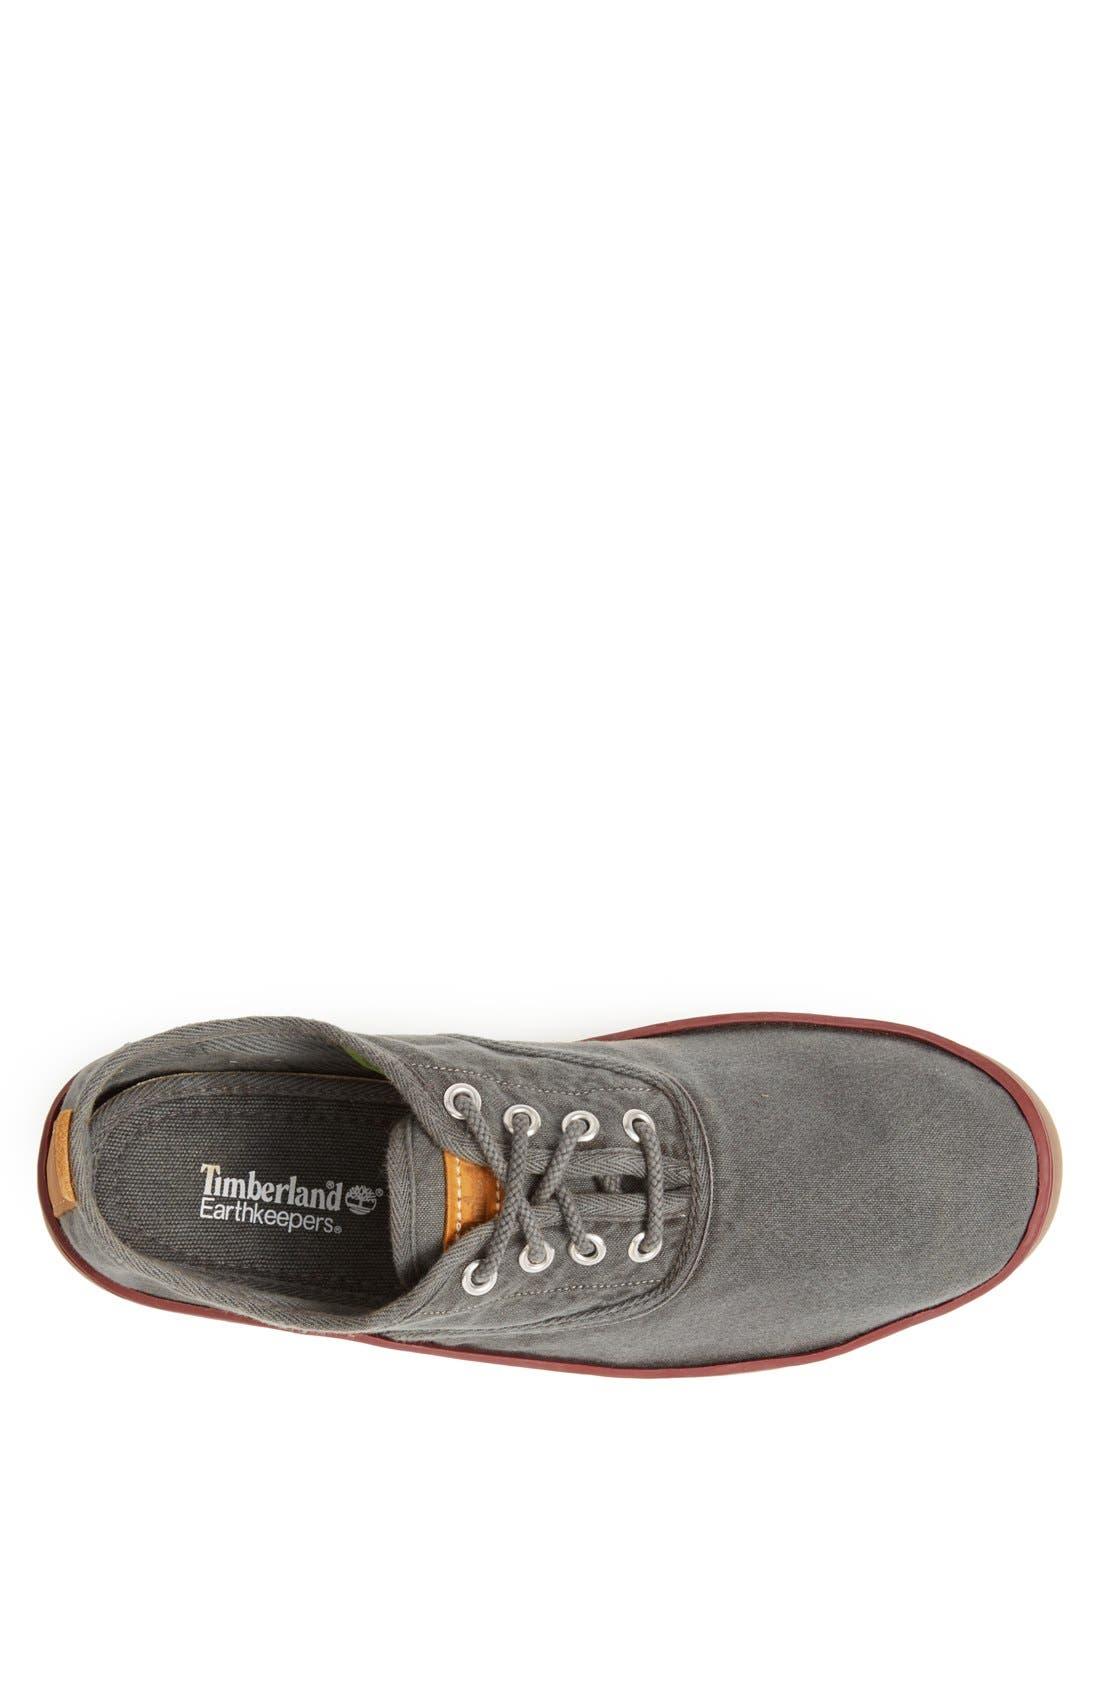 Alternate Image 3  - Timberland Earthkeepers® 'Hookset' Oxford Sneaker